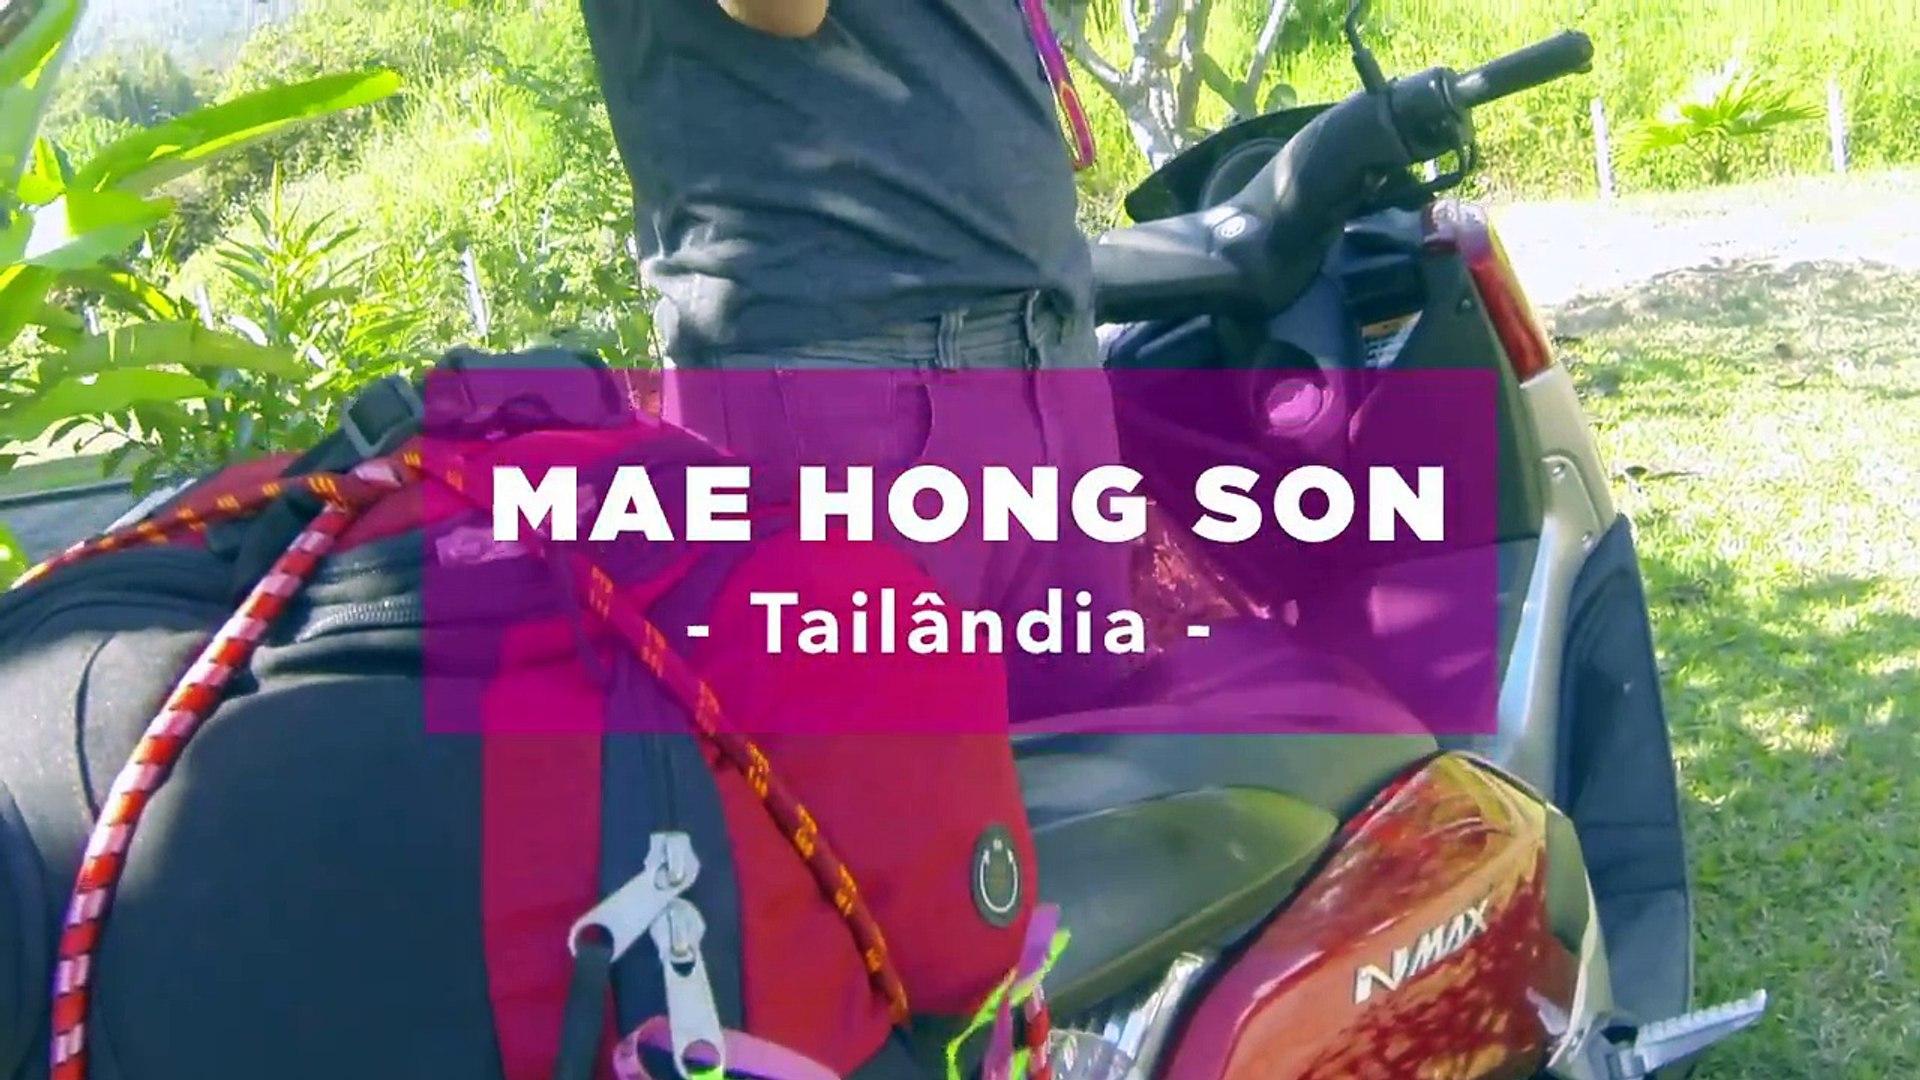 Outras histórias: MAE HONG SON LOOP (Tailândia)